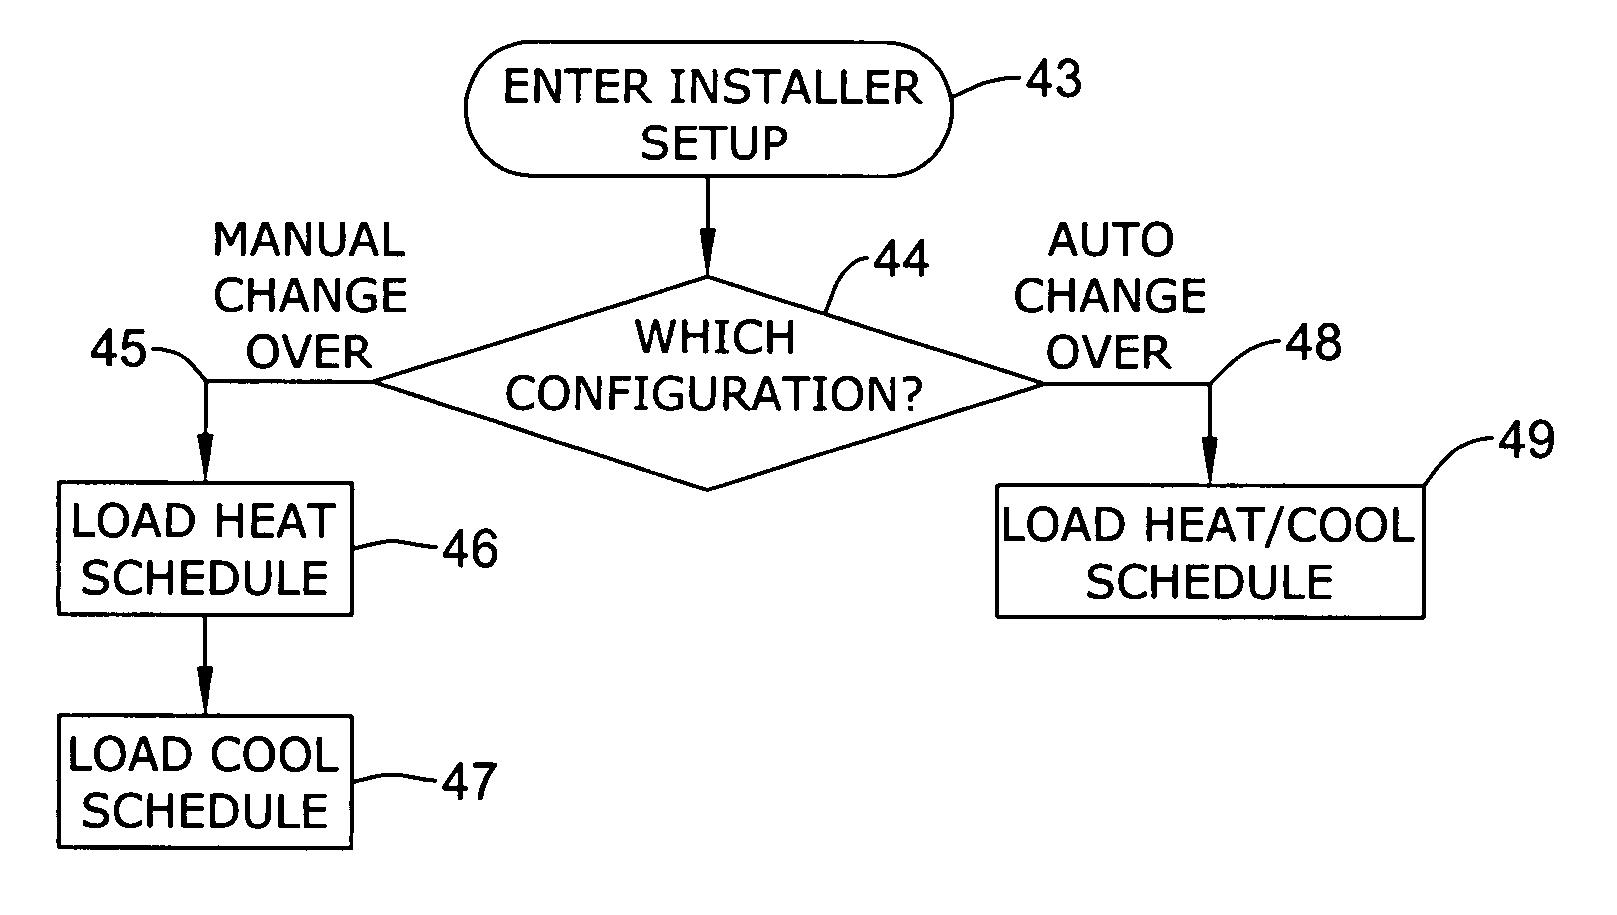 Baystat240 thermostat manual on